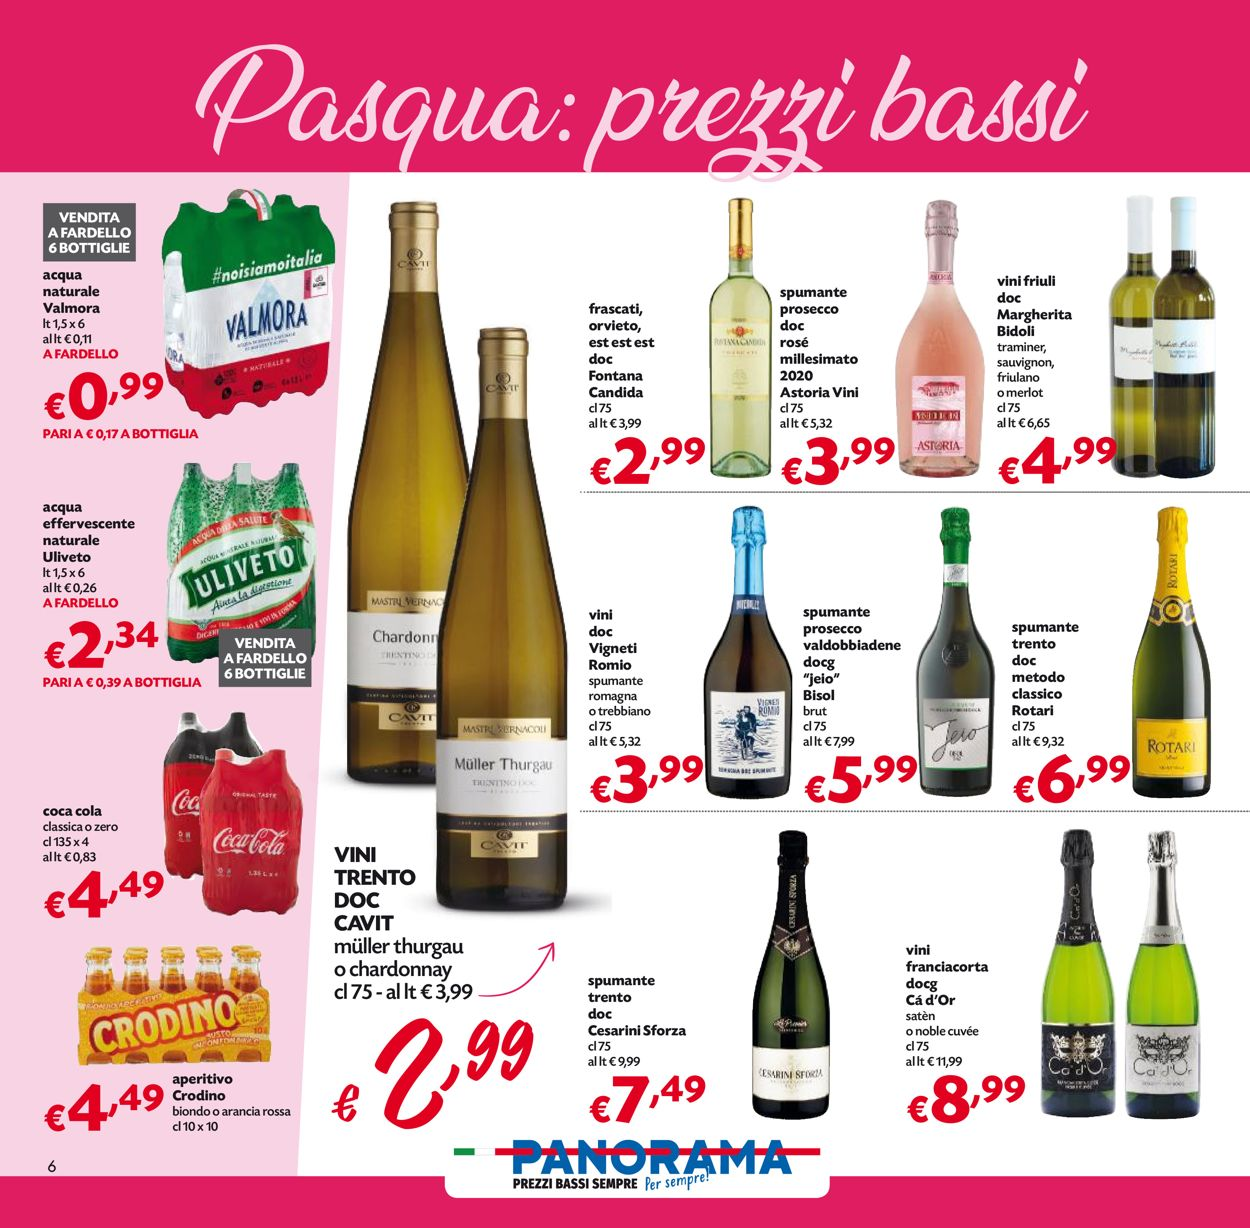 Volantino Pam Panorama - Pasqua 2021! - Offerte 22/03-05/04/2021 (Pagina 6)